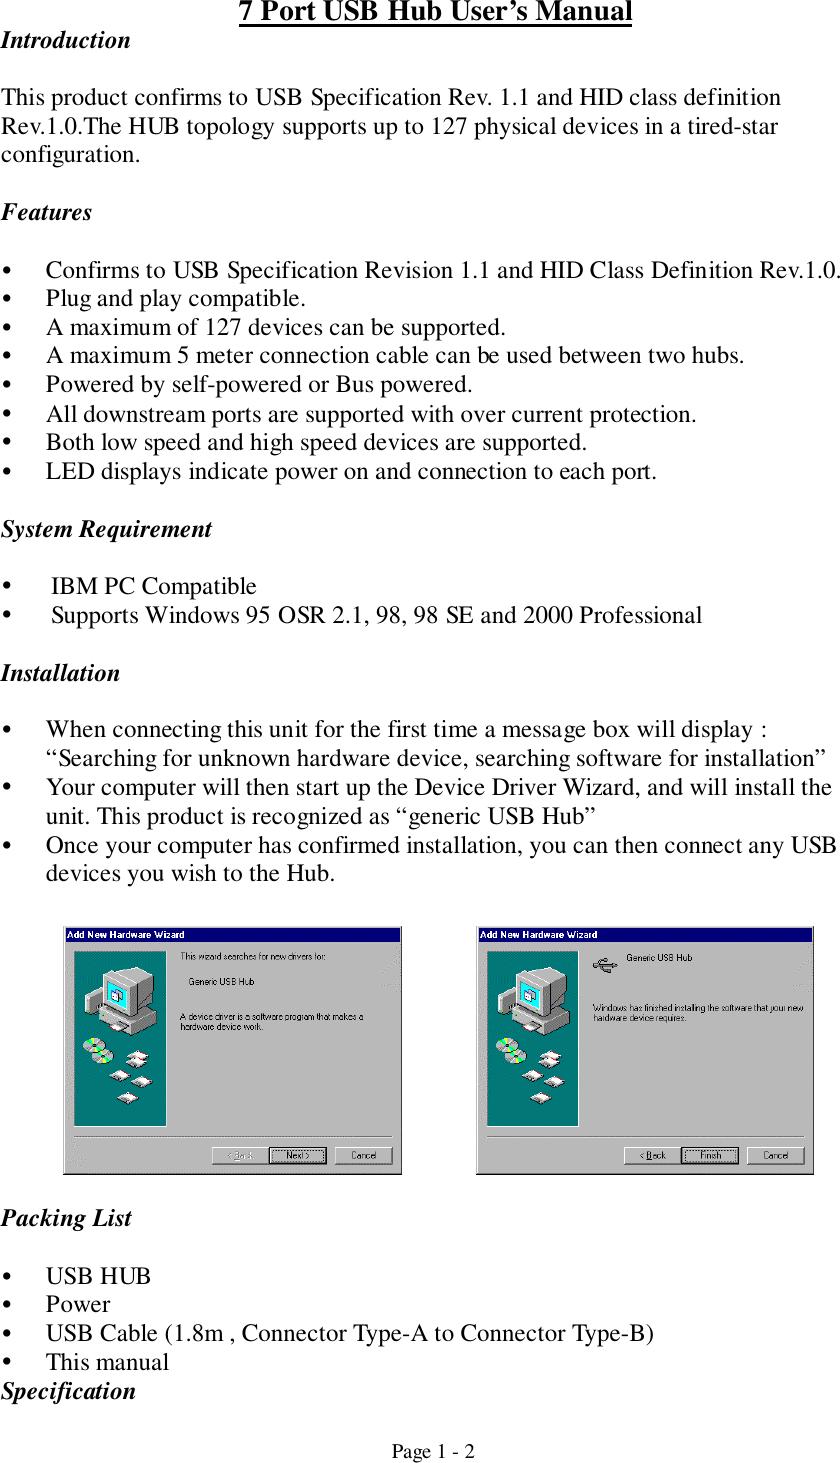 Belkin Components F5U010 7 Port USB Hub User Manual Updated